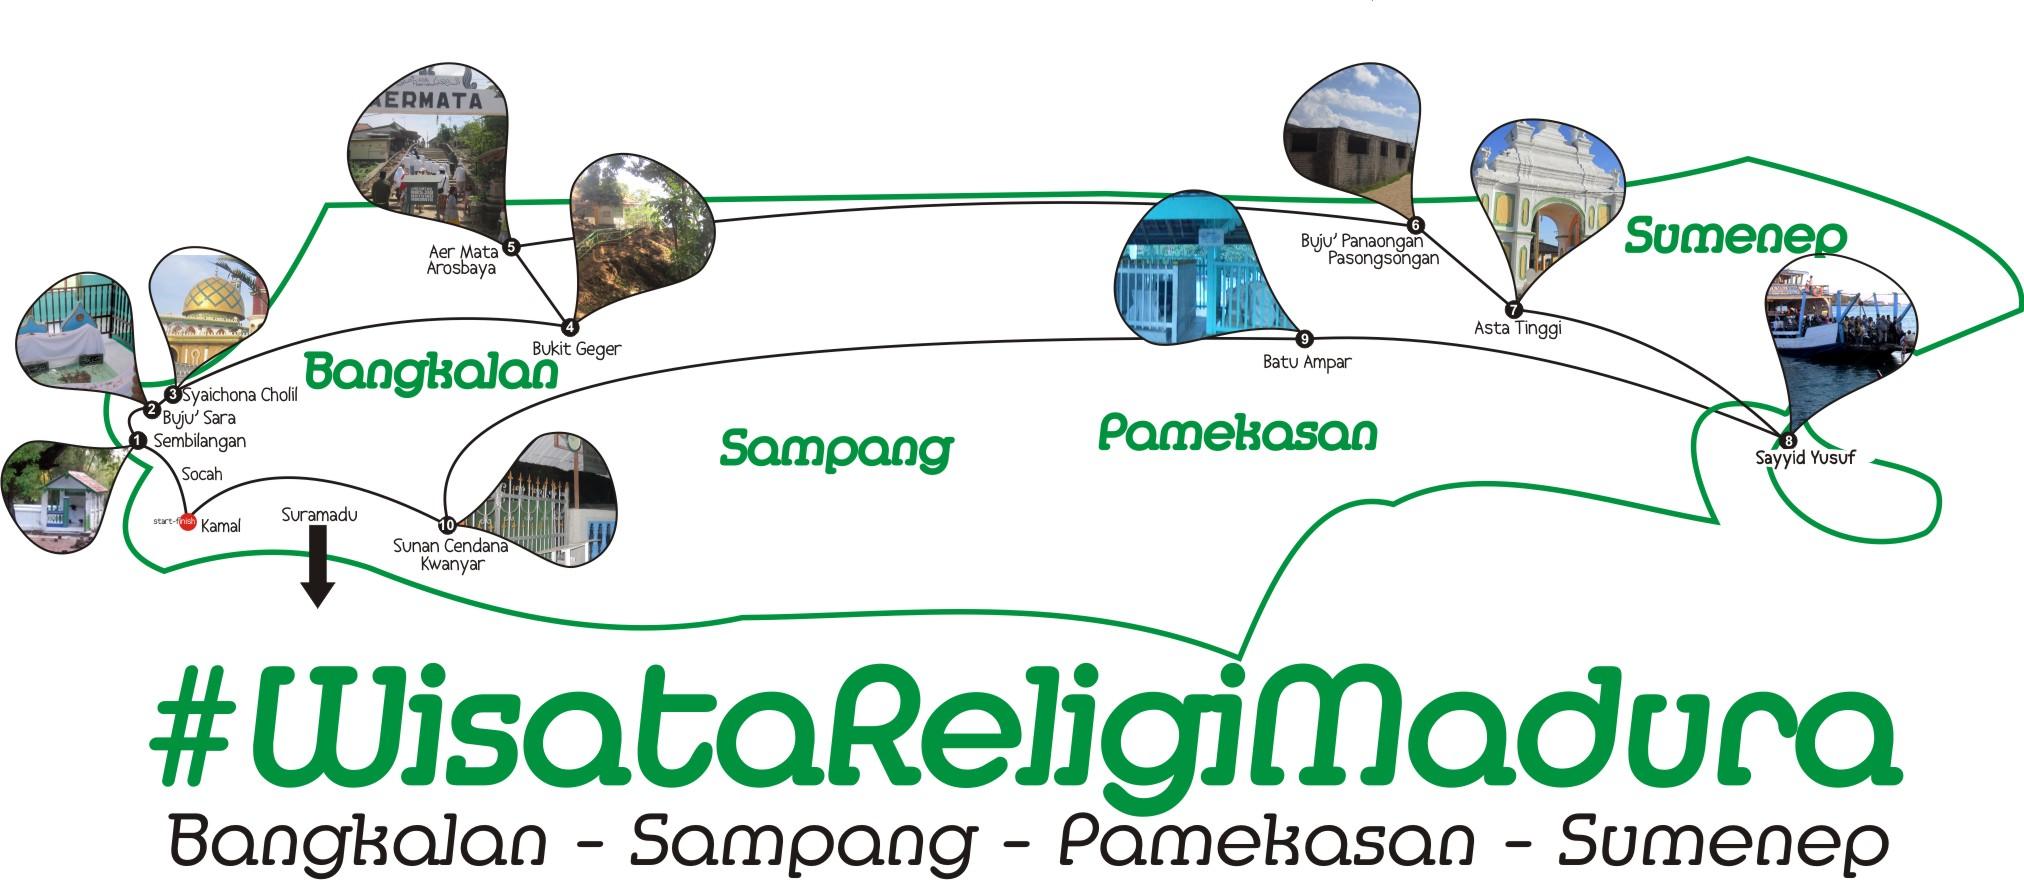 Wisatareligimadura 3 Hutan Atas Bukit Blogger Plat Madura Geger Islam